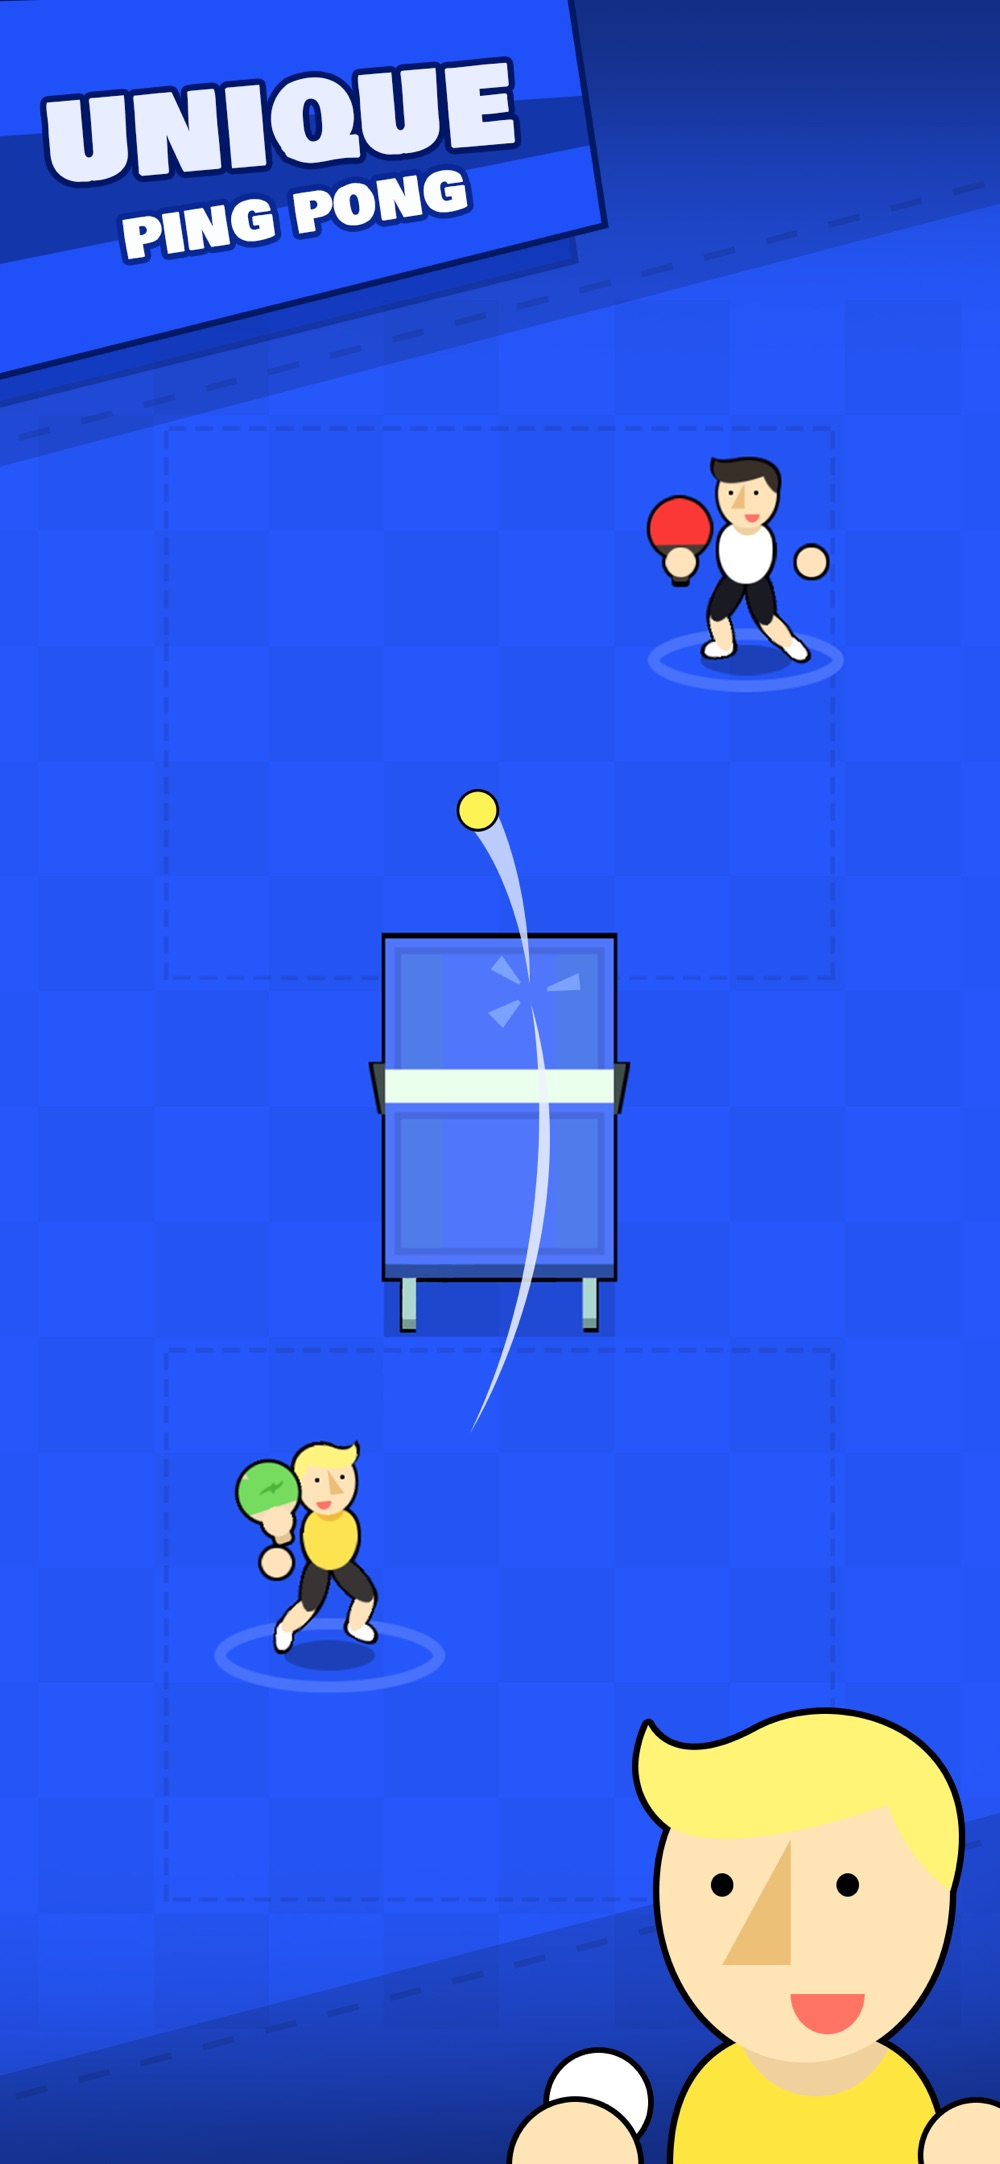 Pongfinity – Ping Pong